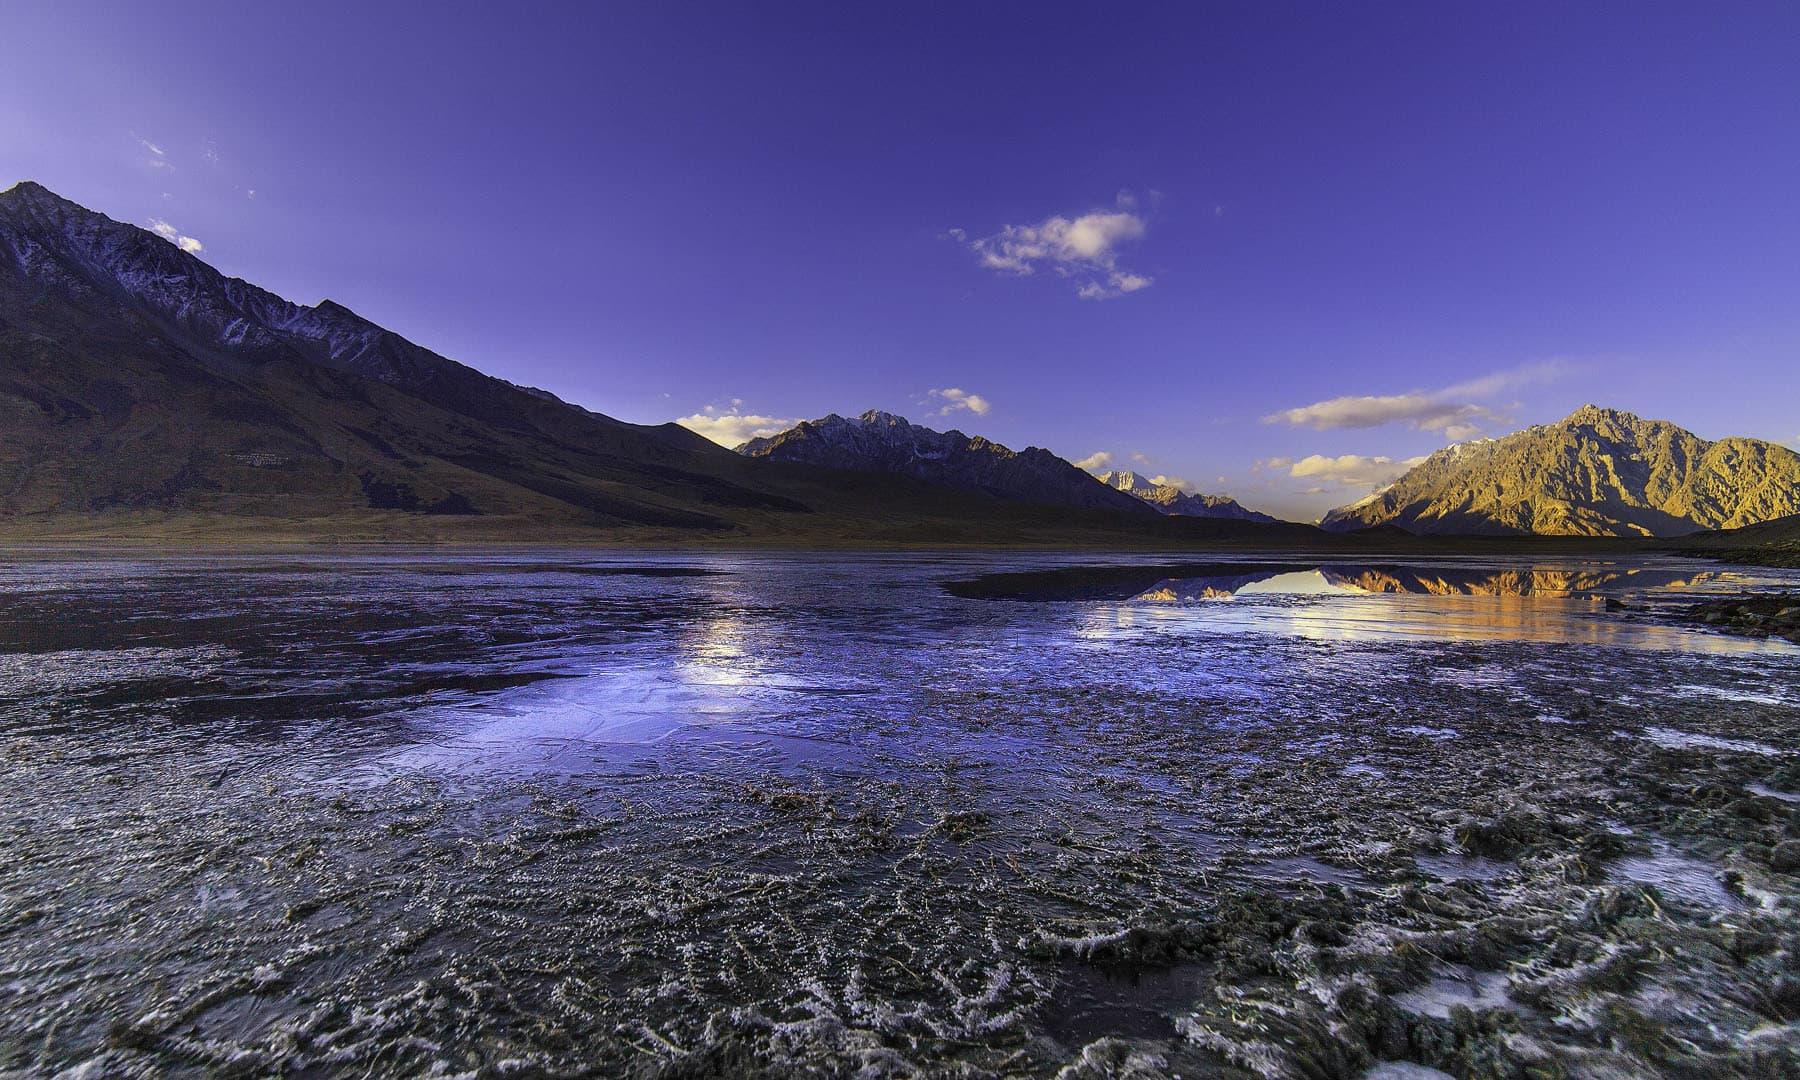 سردی سے جم چکی شندور جھیل— سید مہدی بخاری